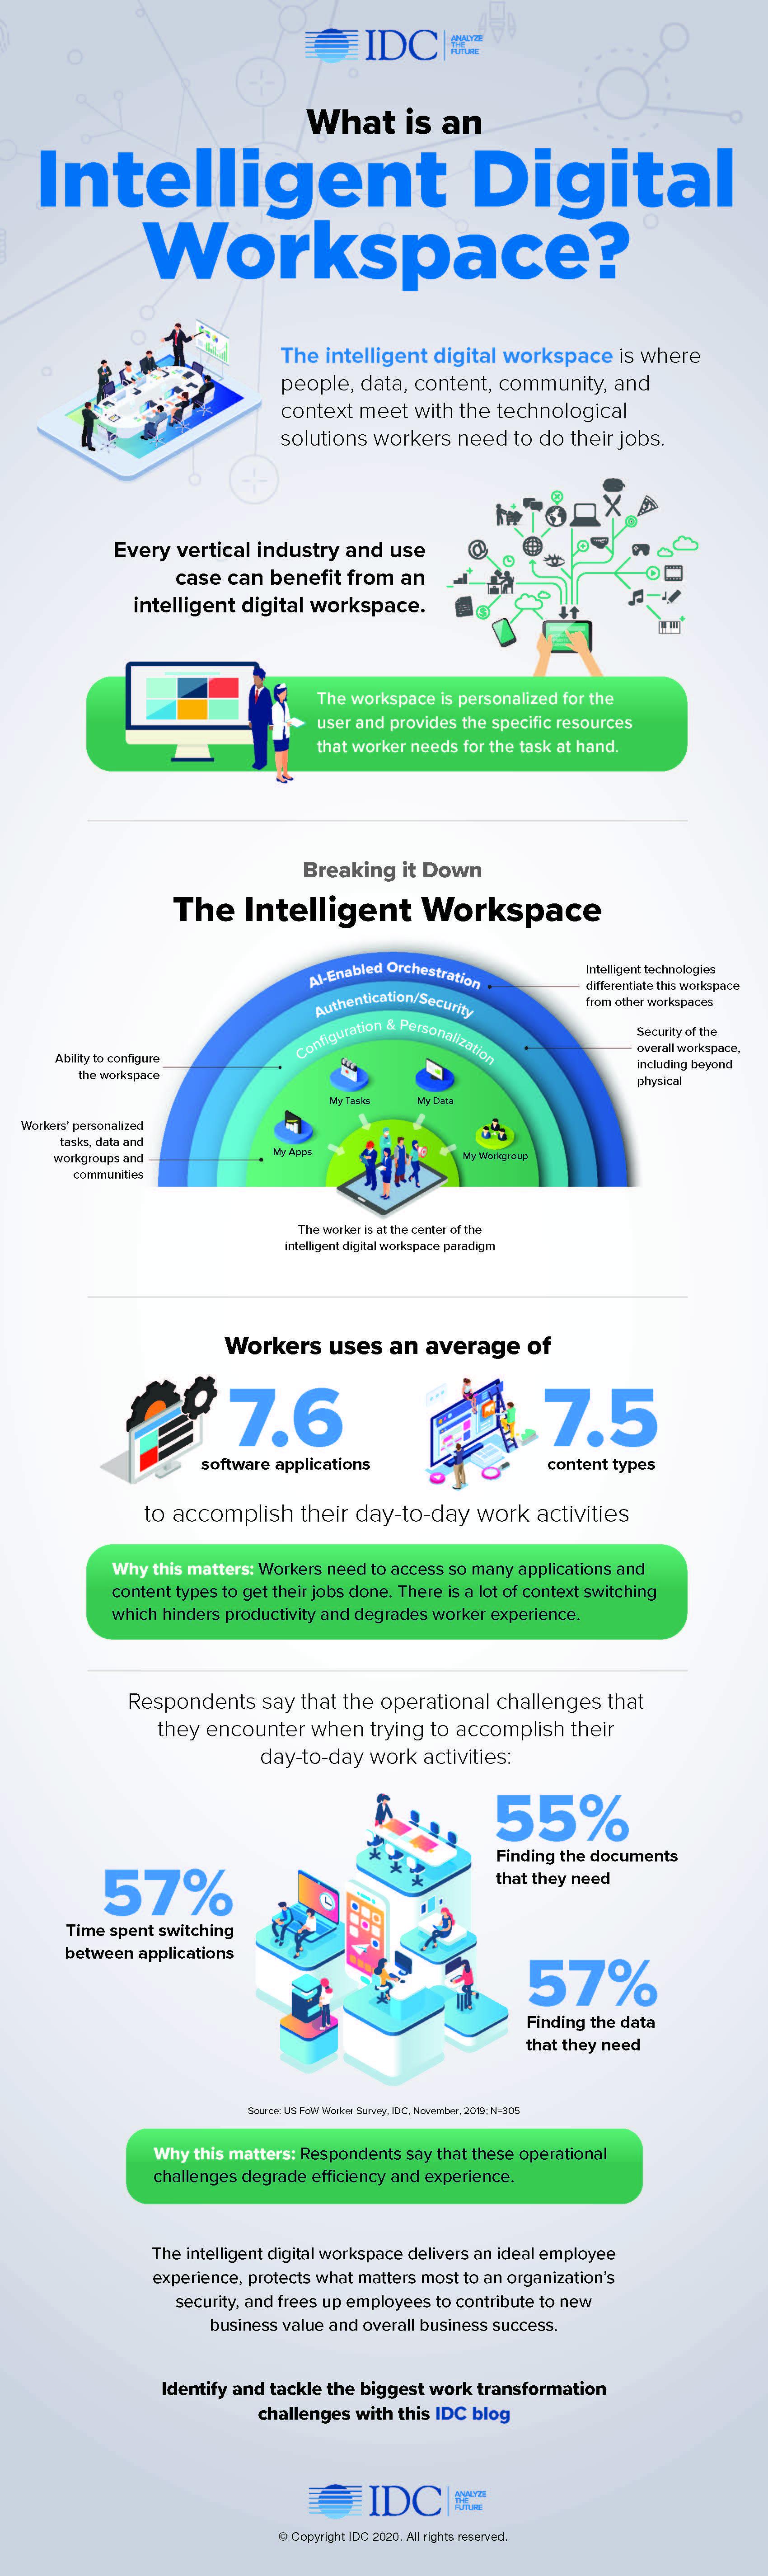 IDC-What-is-Intelligent-Digital-Workspace-Infographic